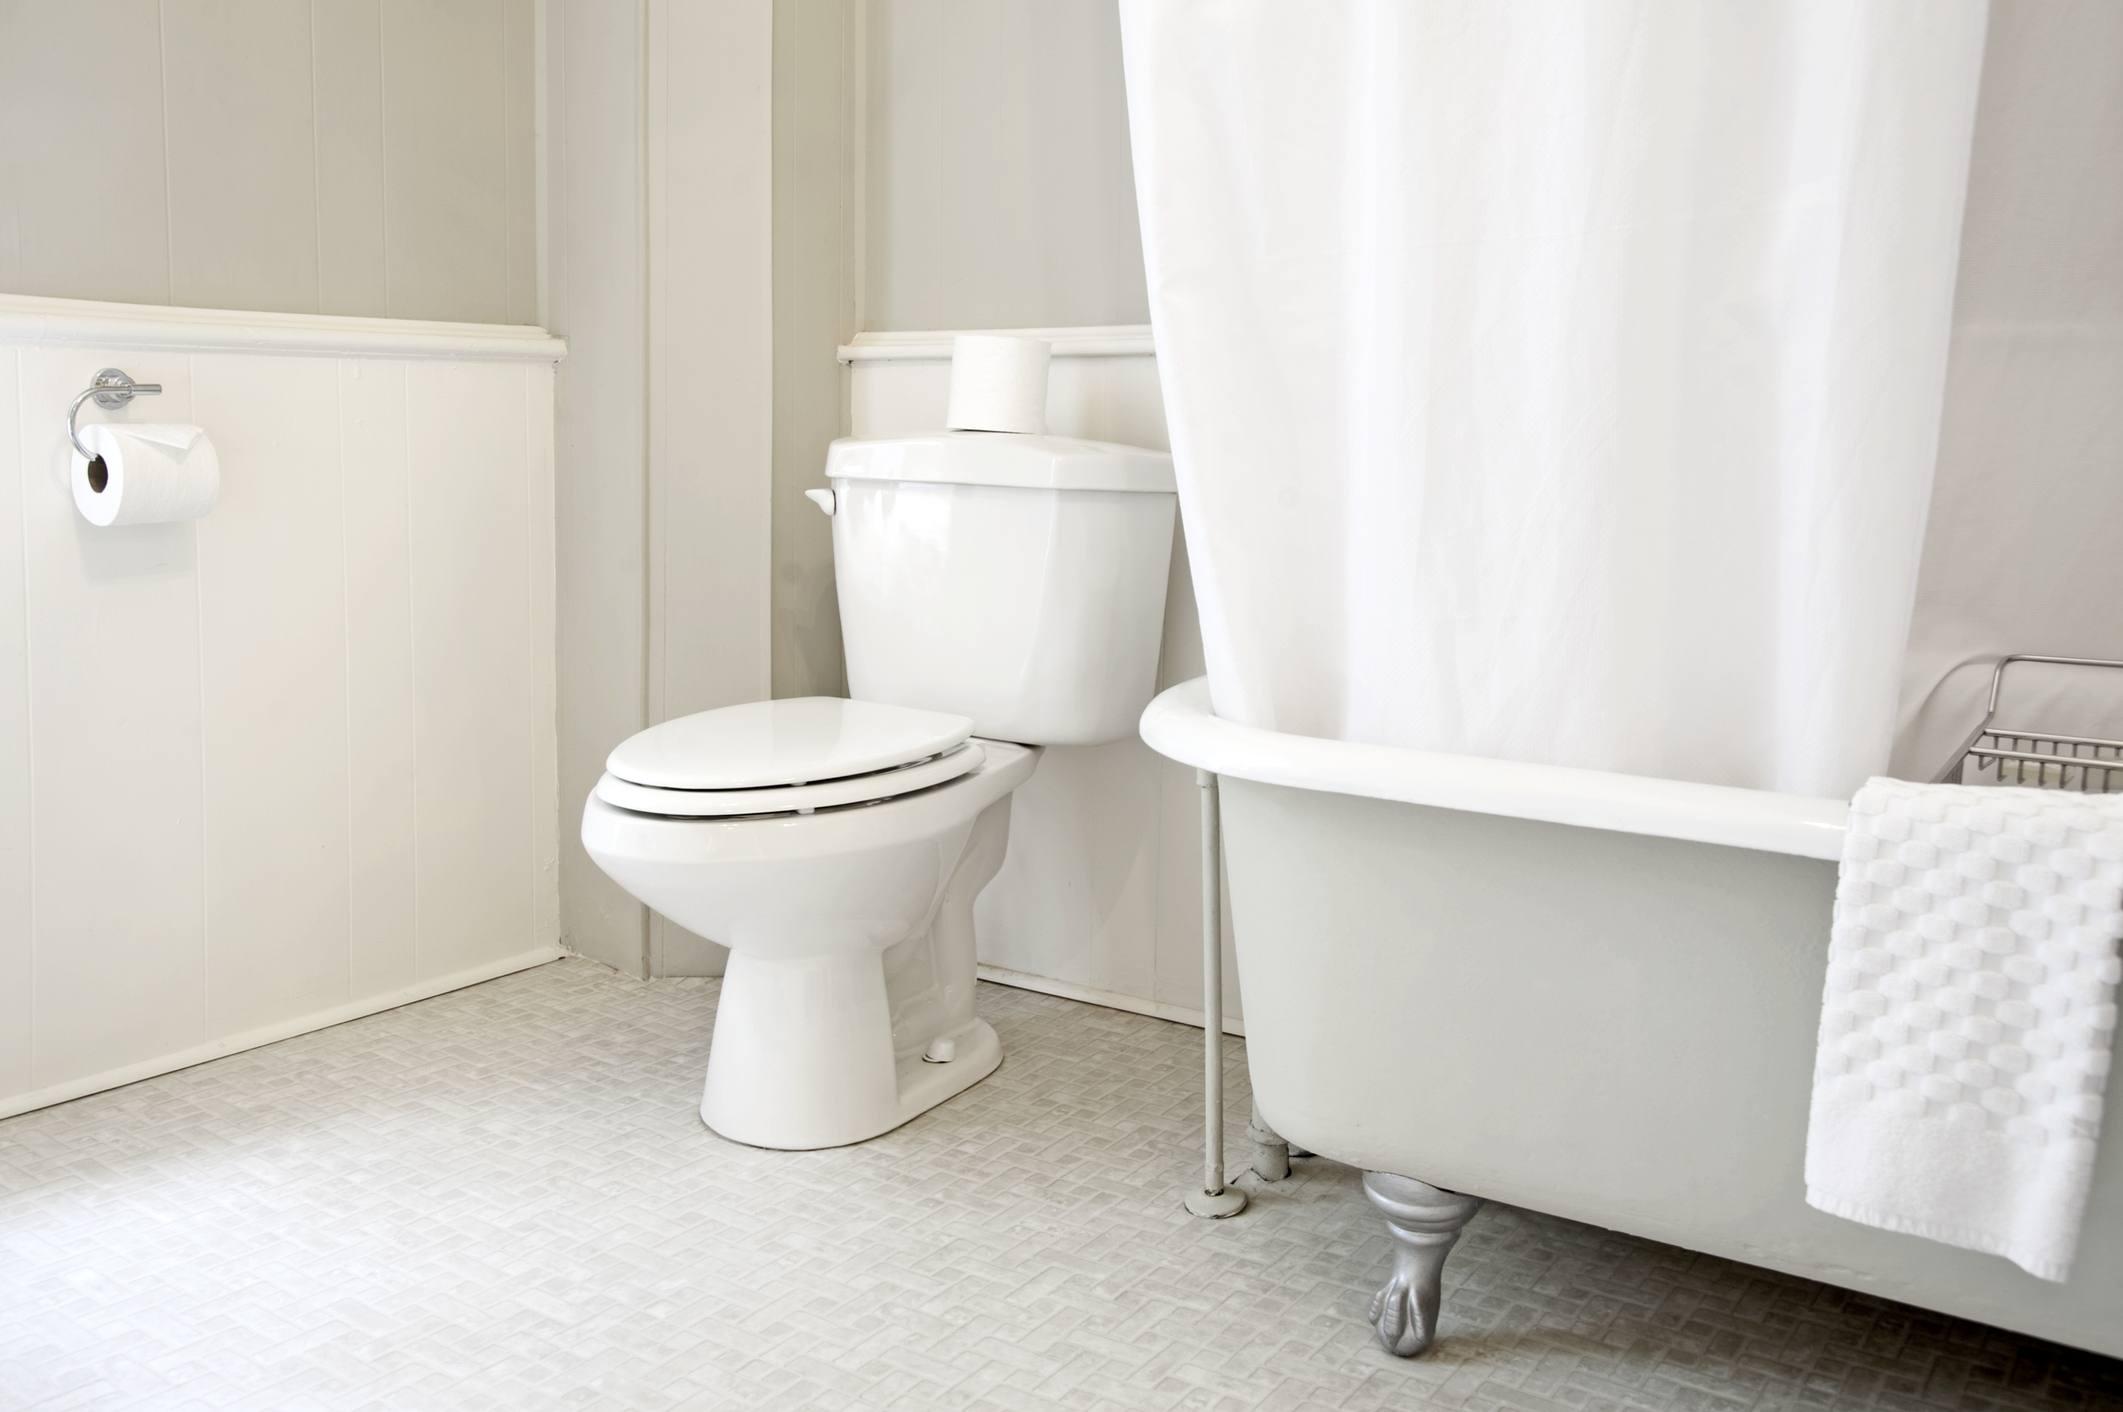 Toilet cramped in the corner of the bathroom